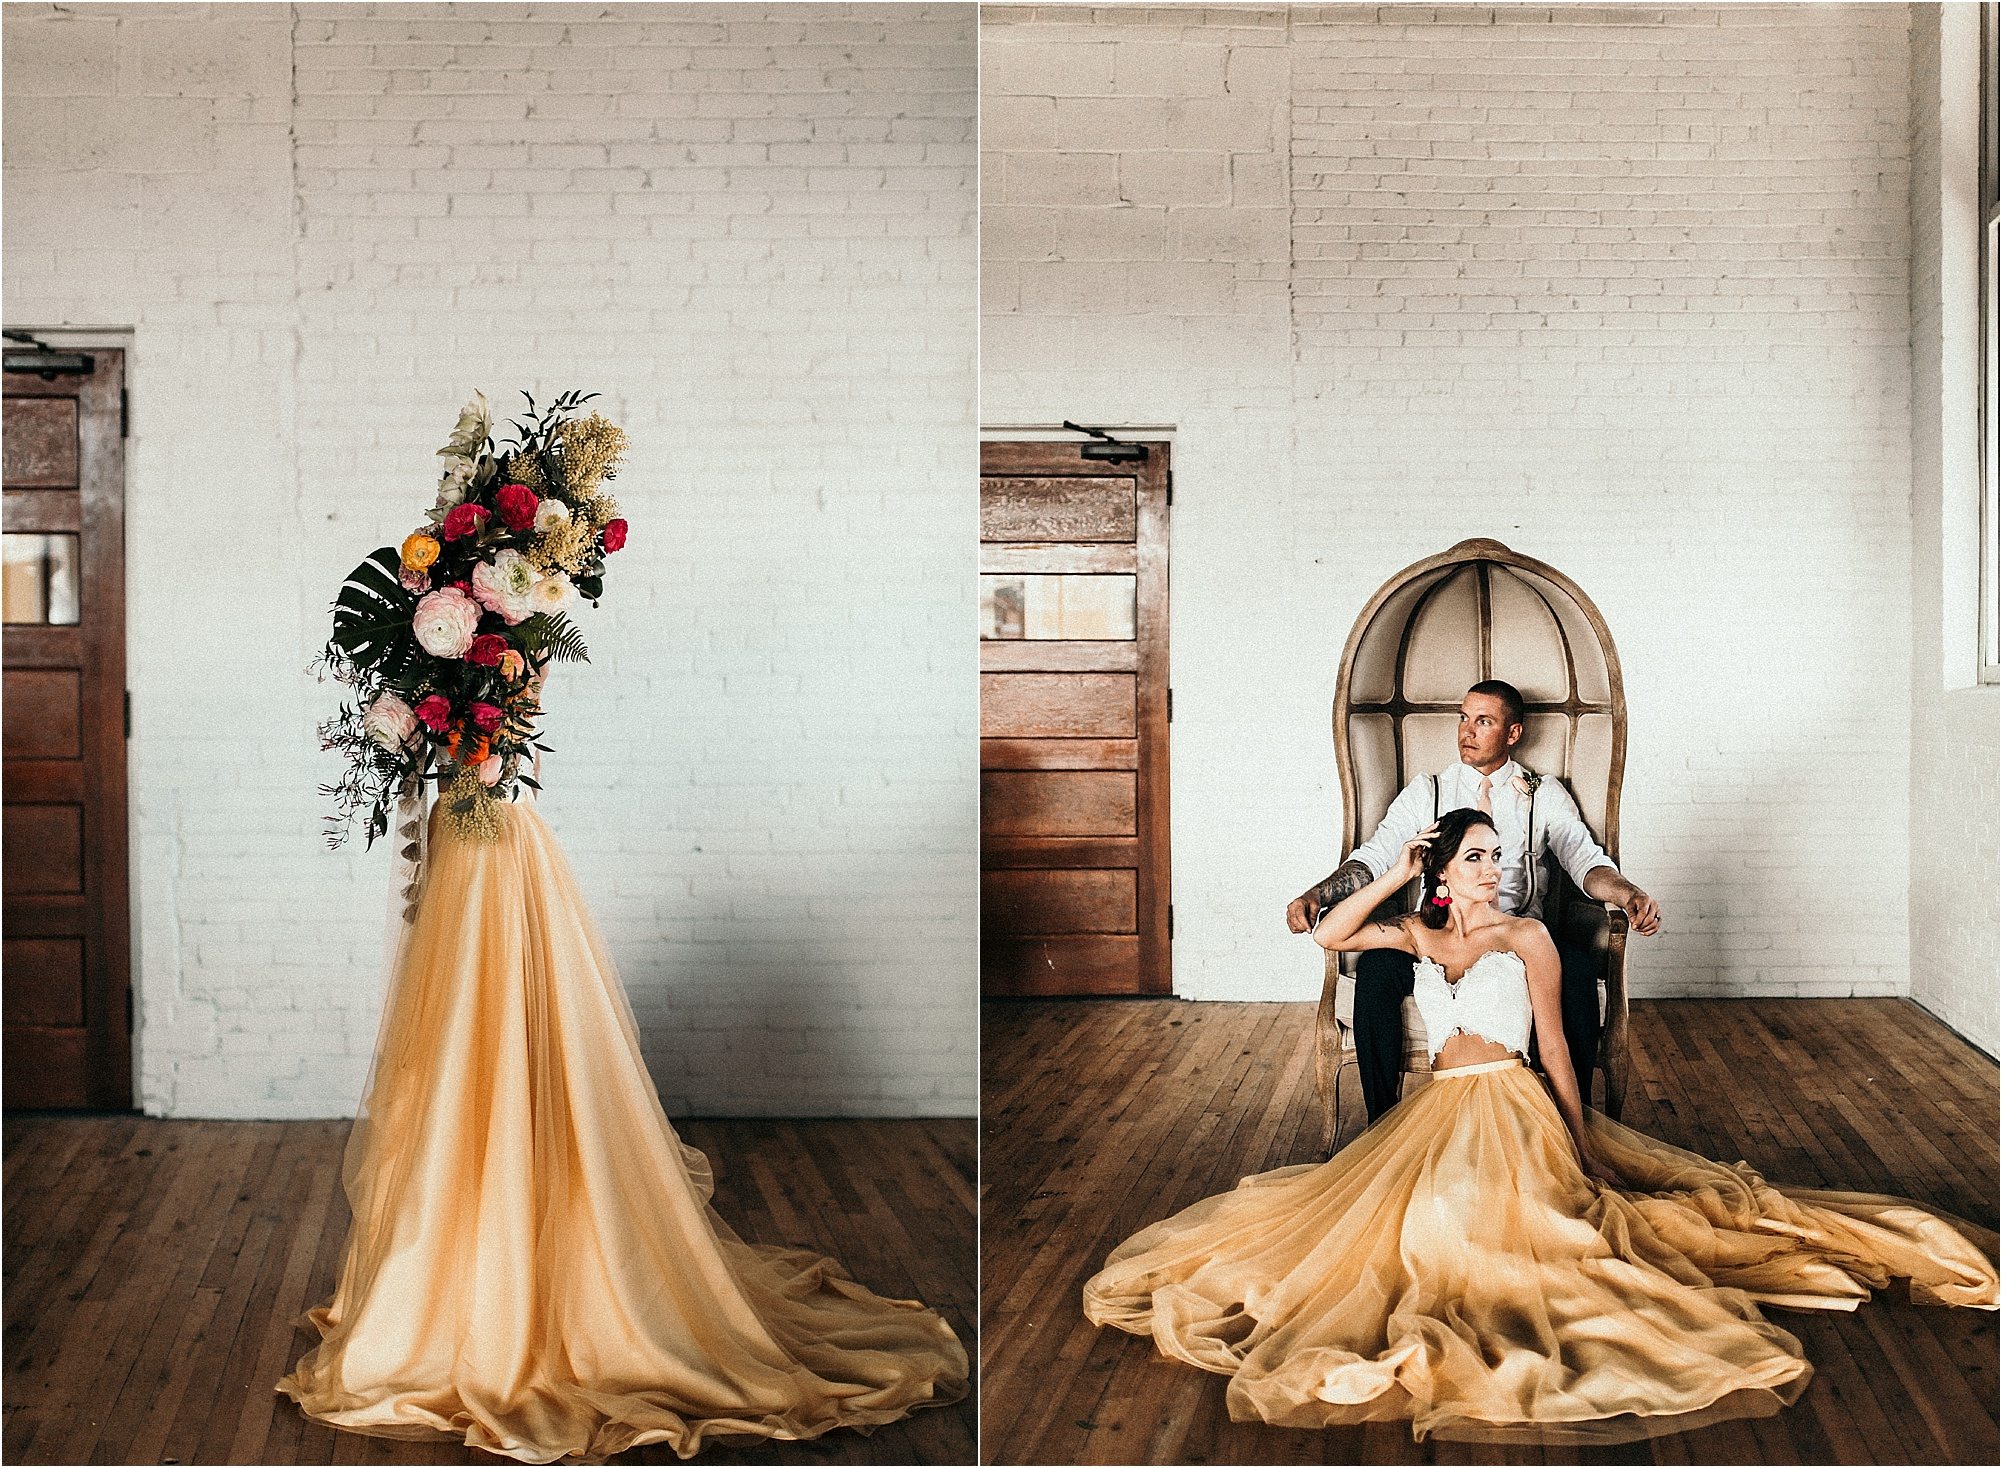 Old-South-Vintage-Rentals-Bride-avonne-photography_0019.jpg